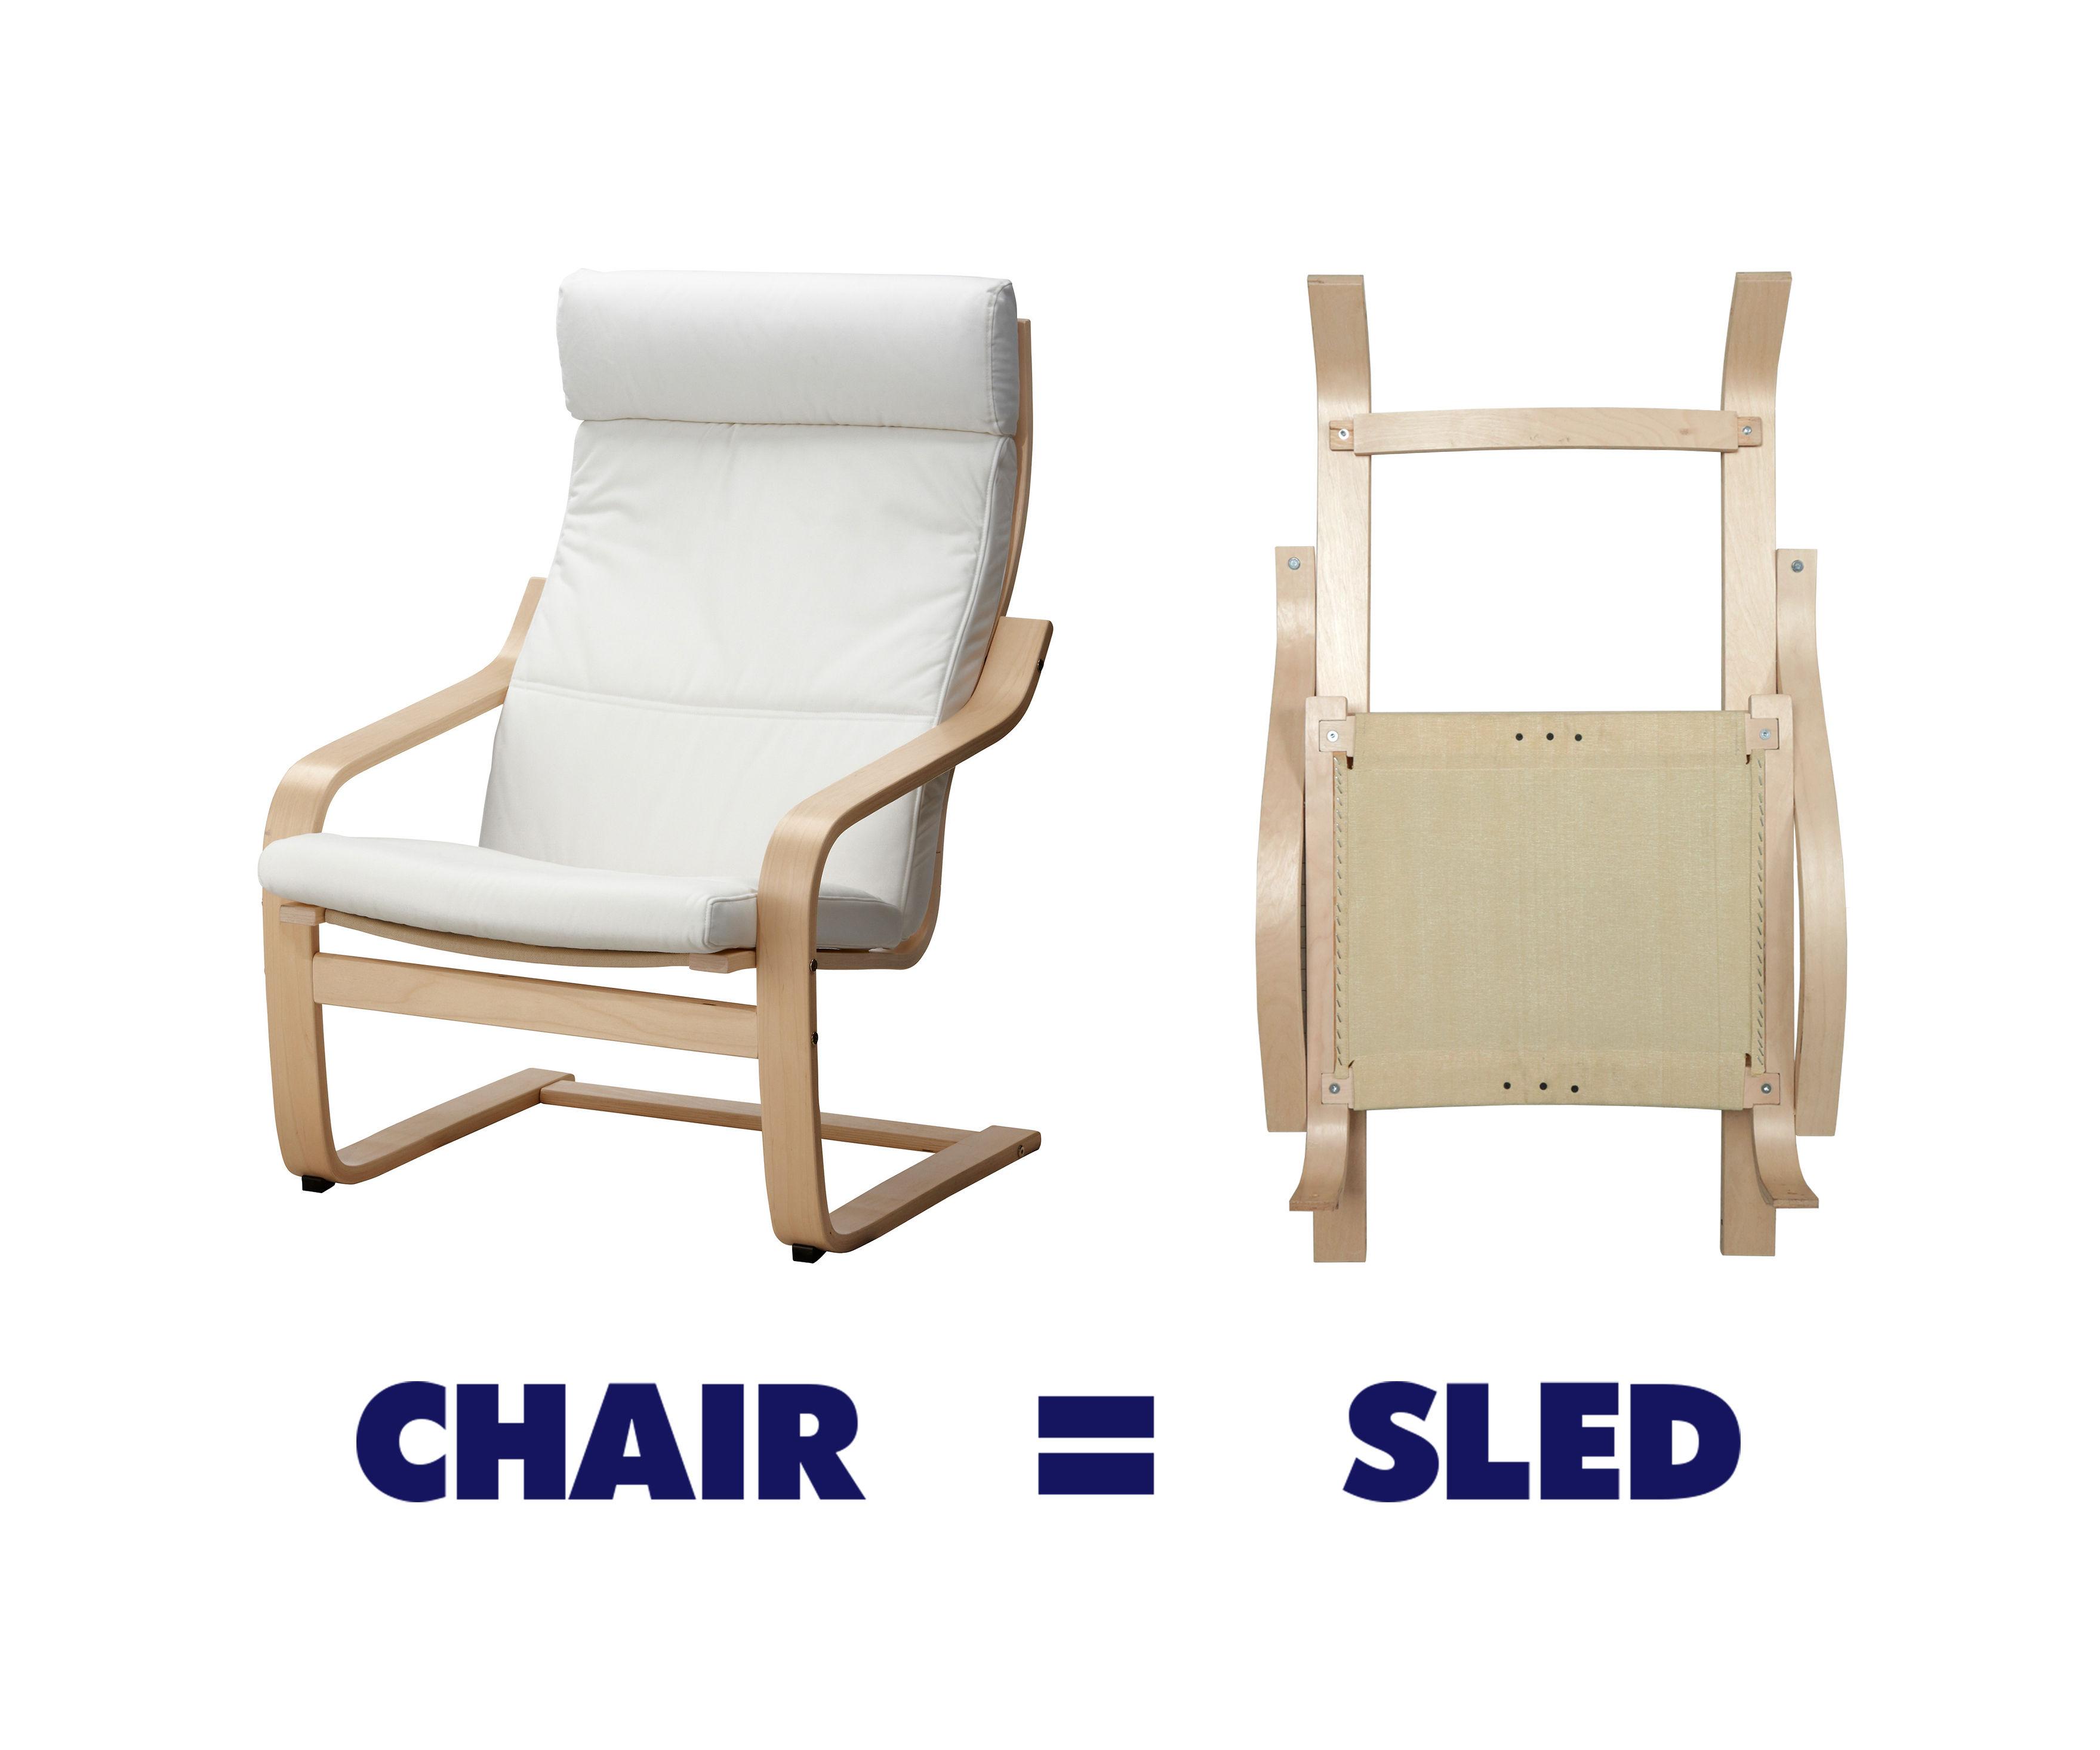 Ikea Chair Sled